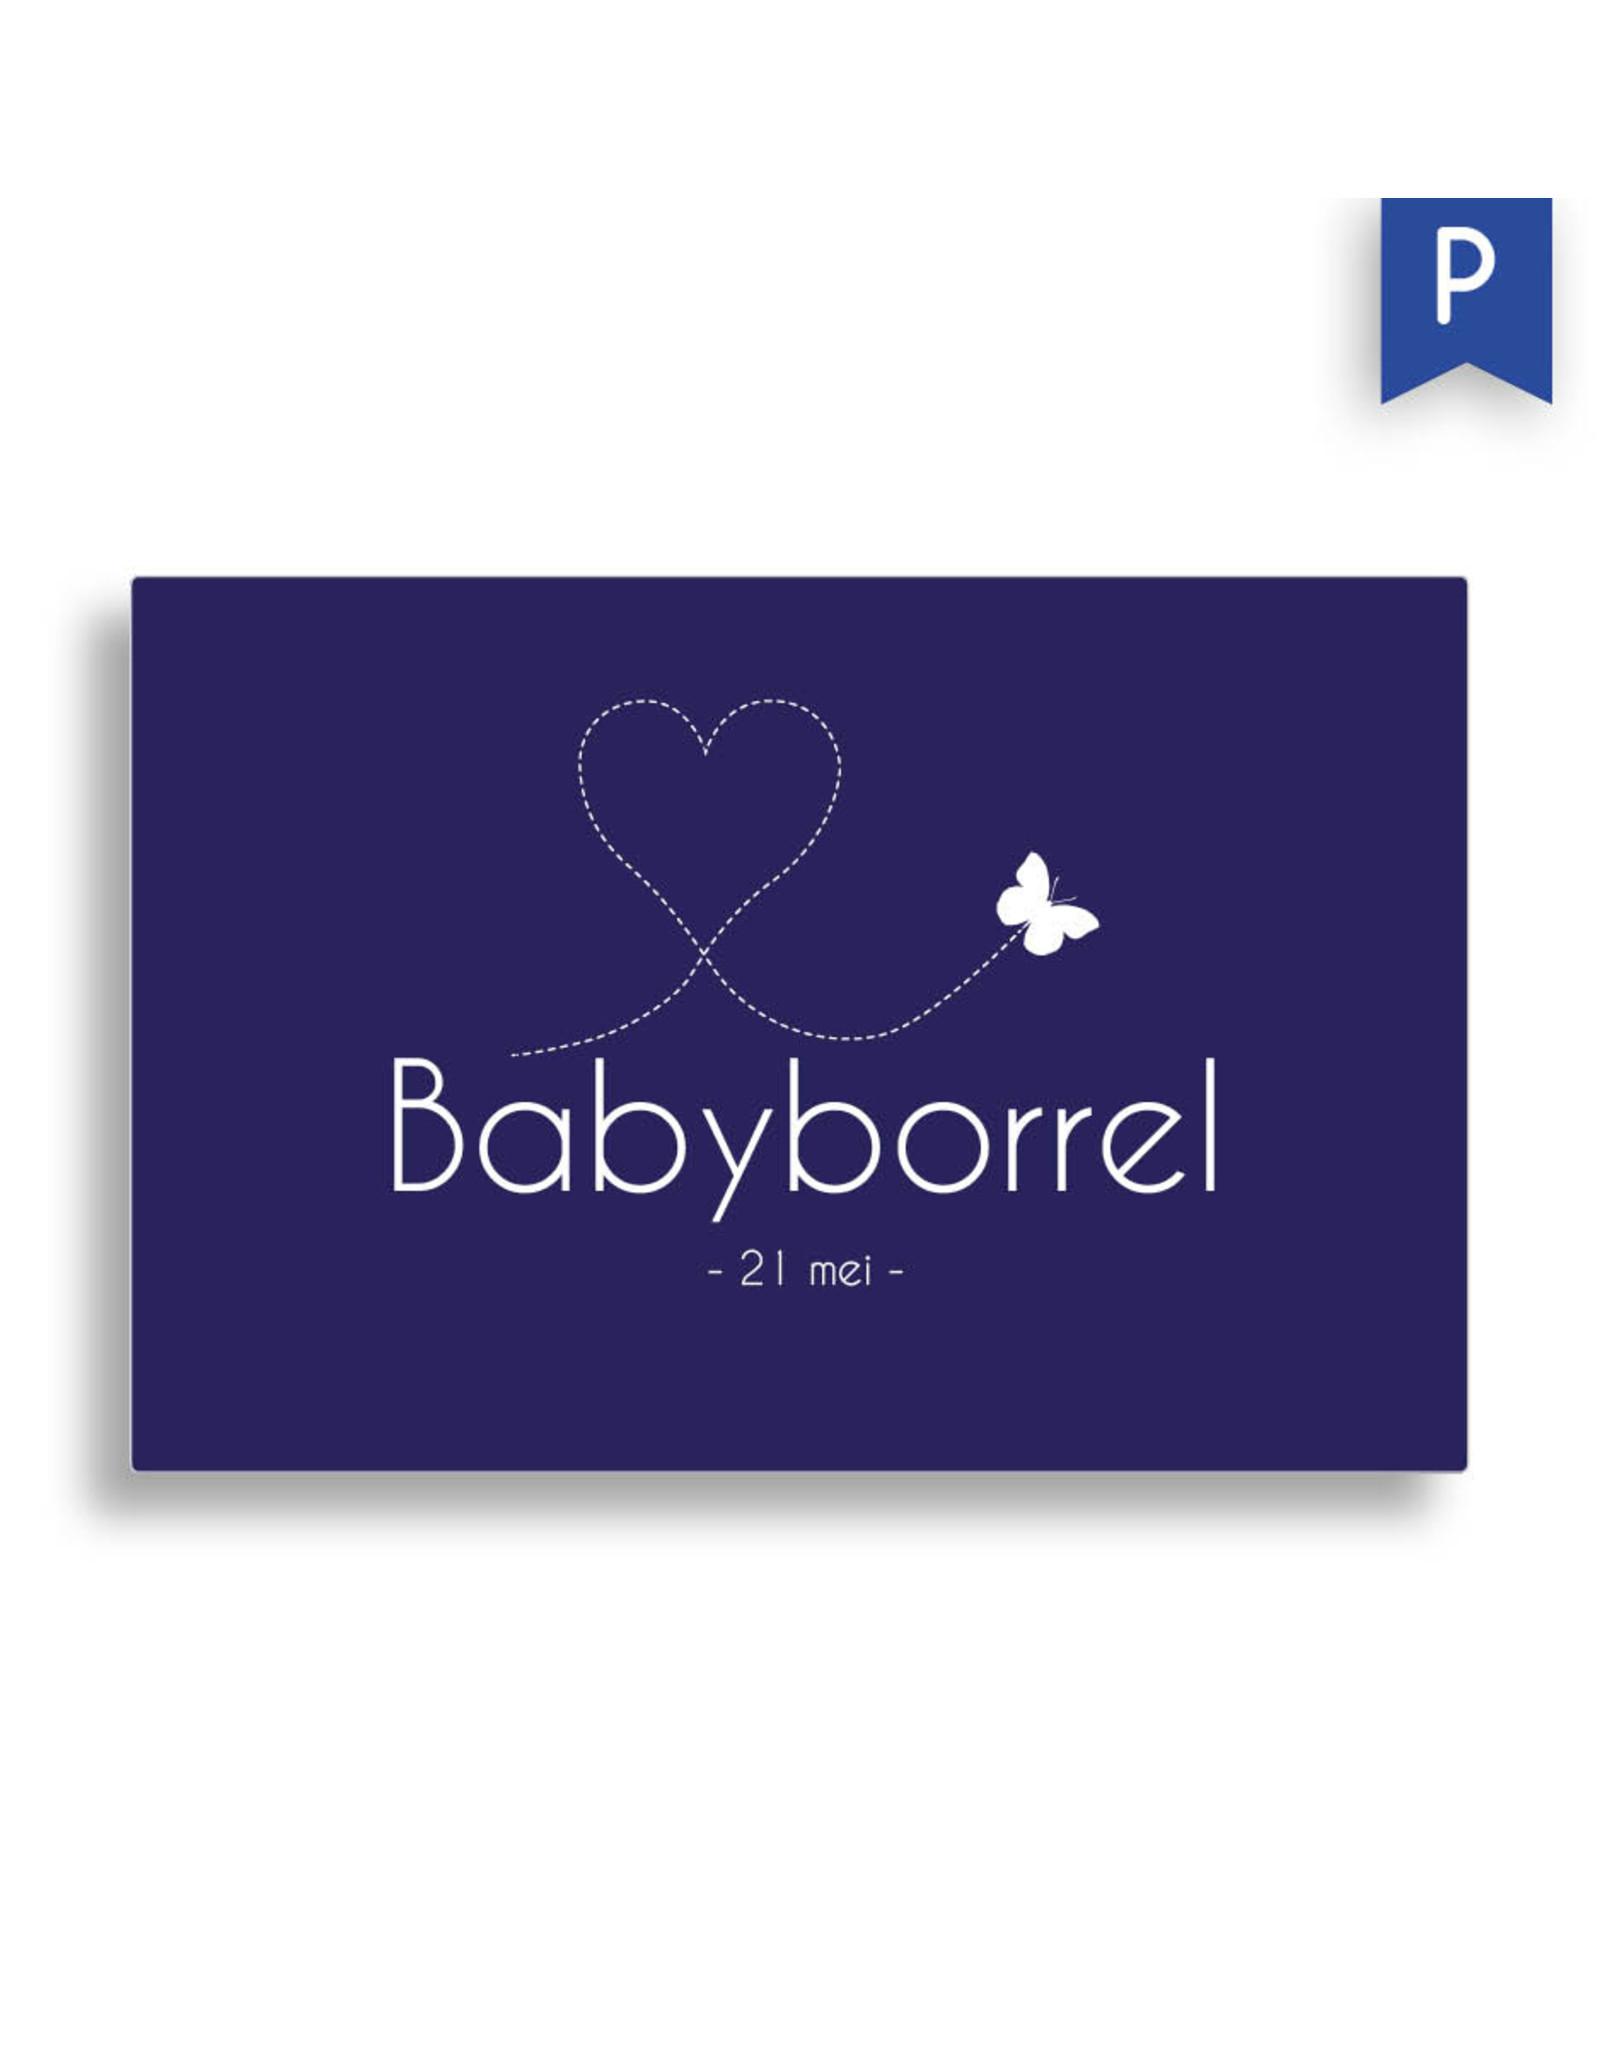 www.Robin.cards Babyborrel enkel rechthoek PEPIJN